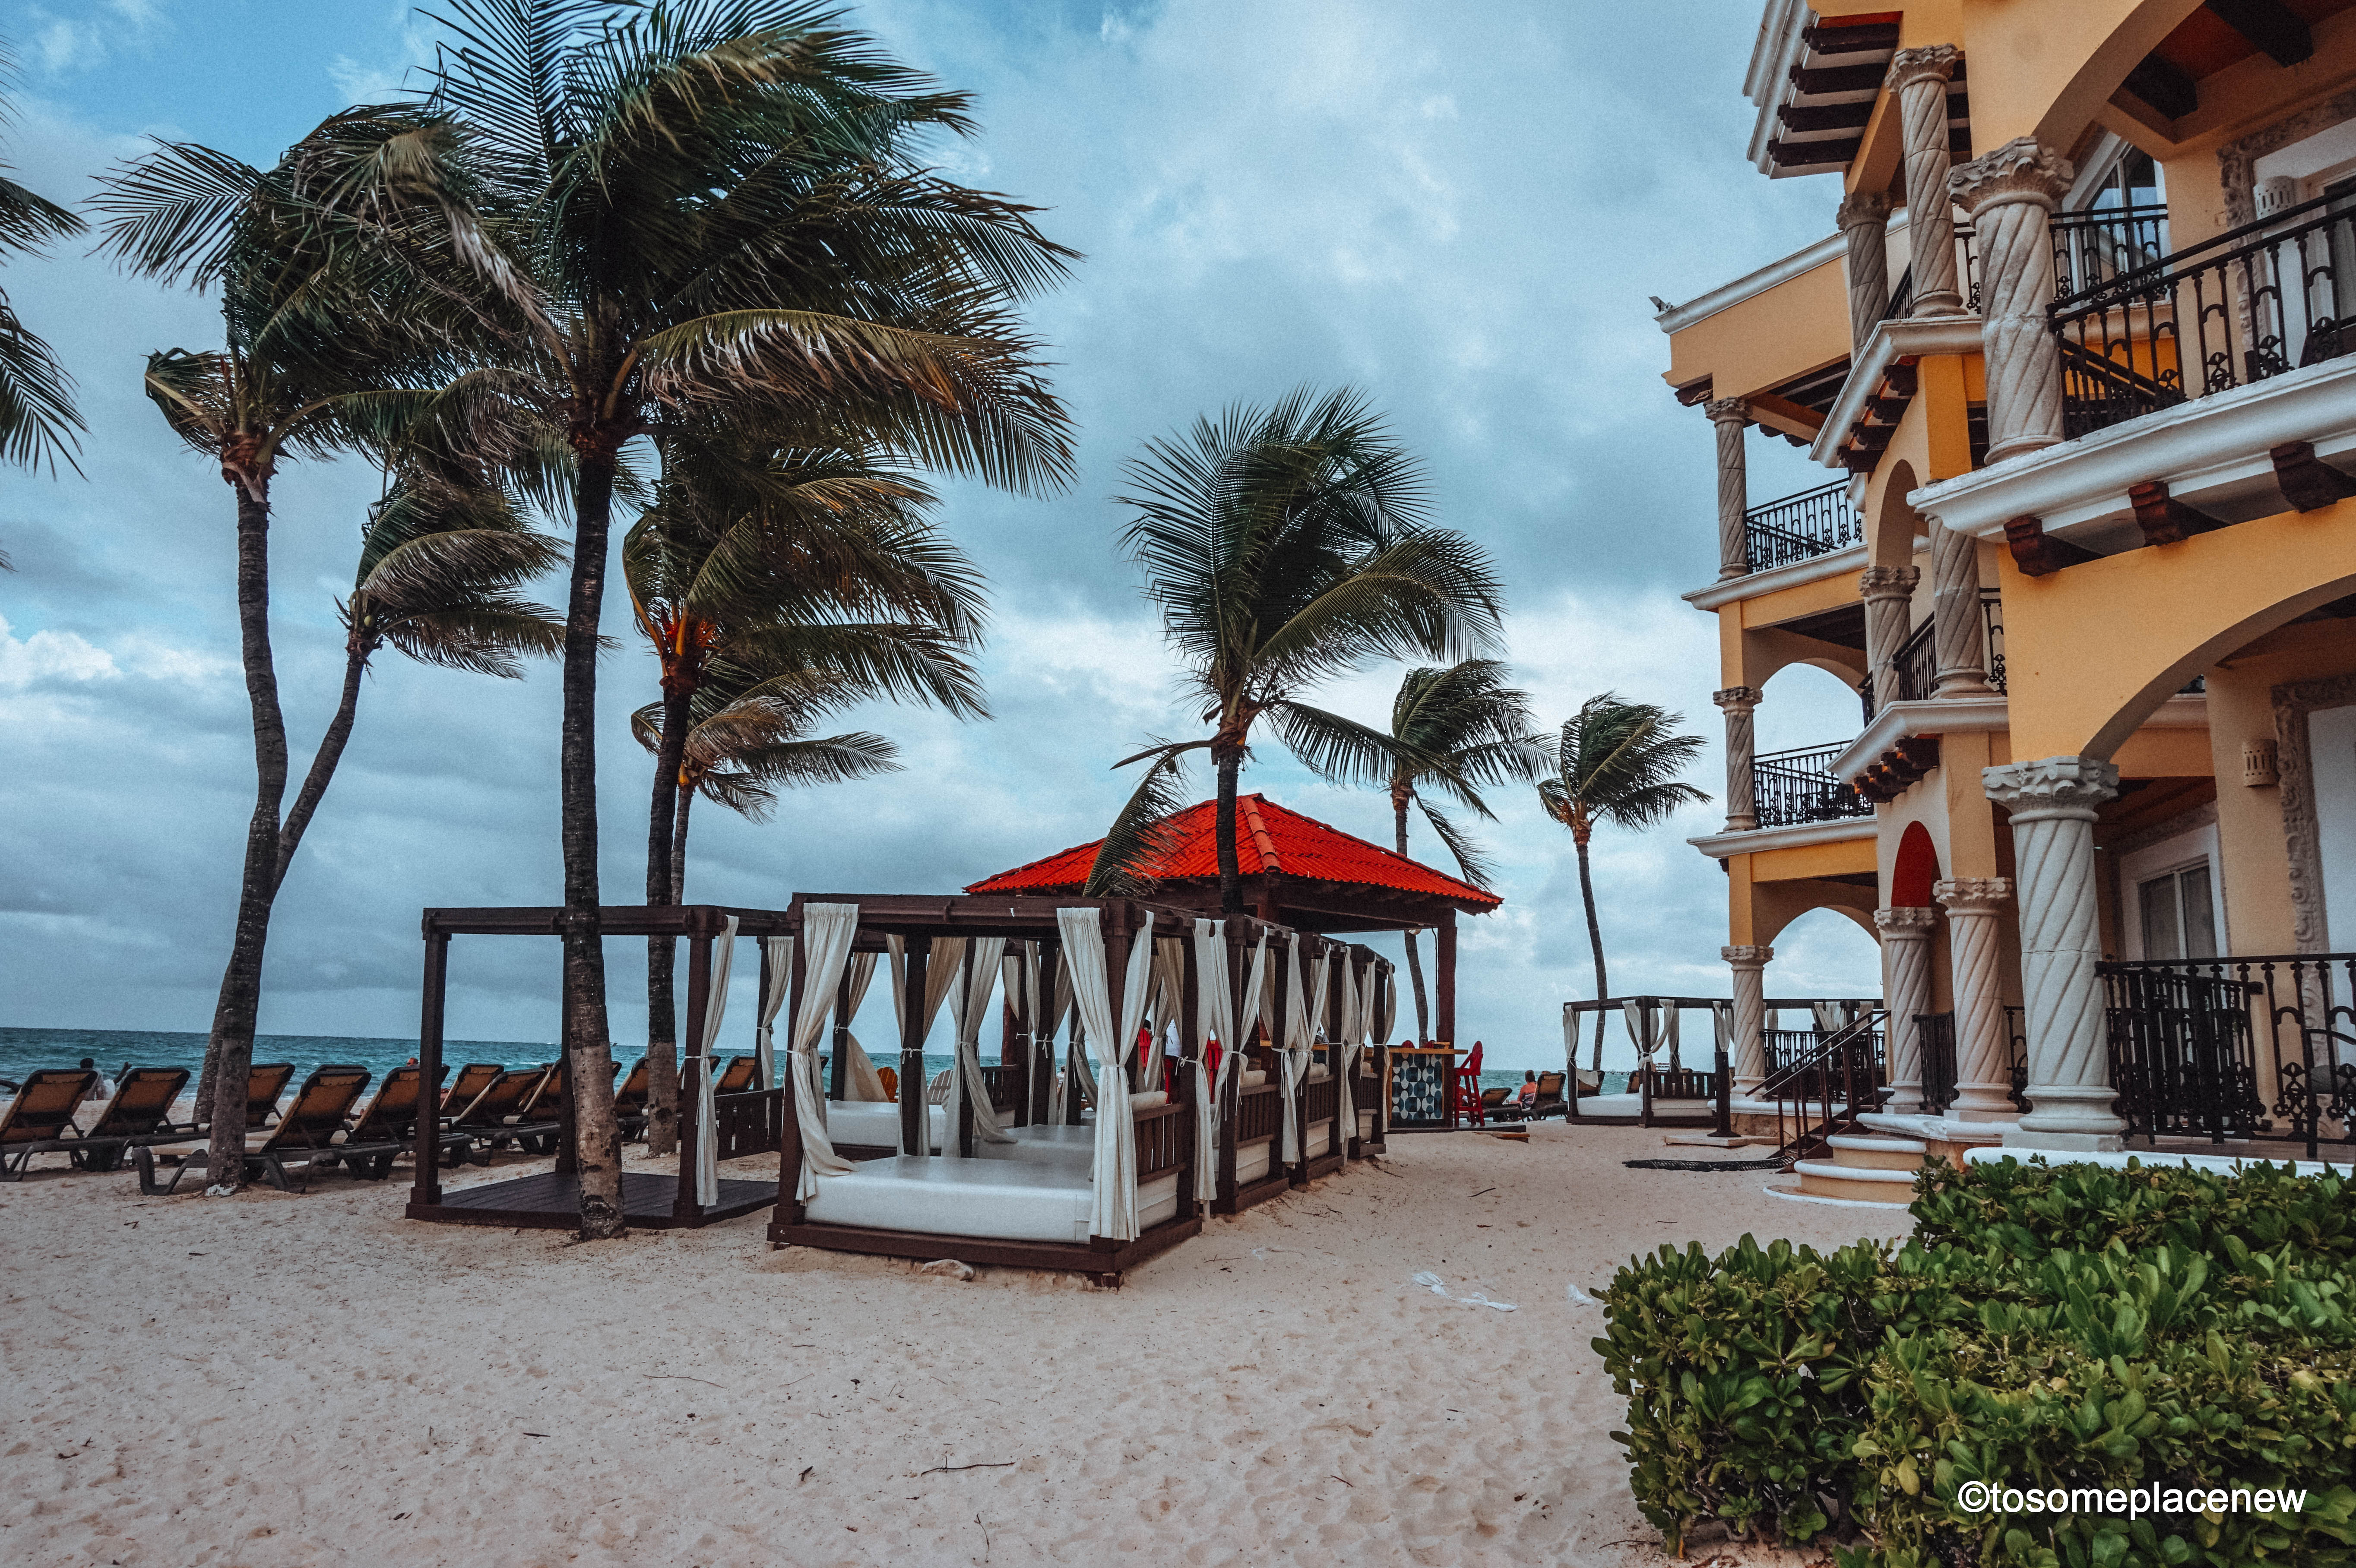 Beach Resort - Mexico